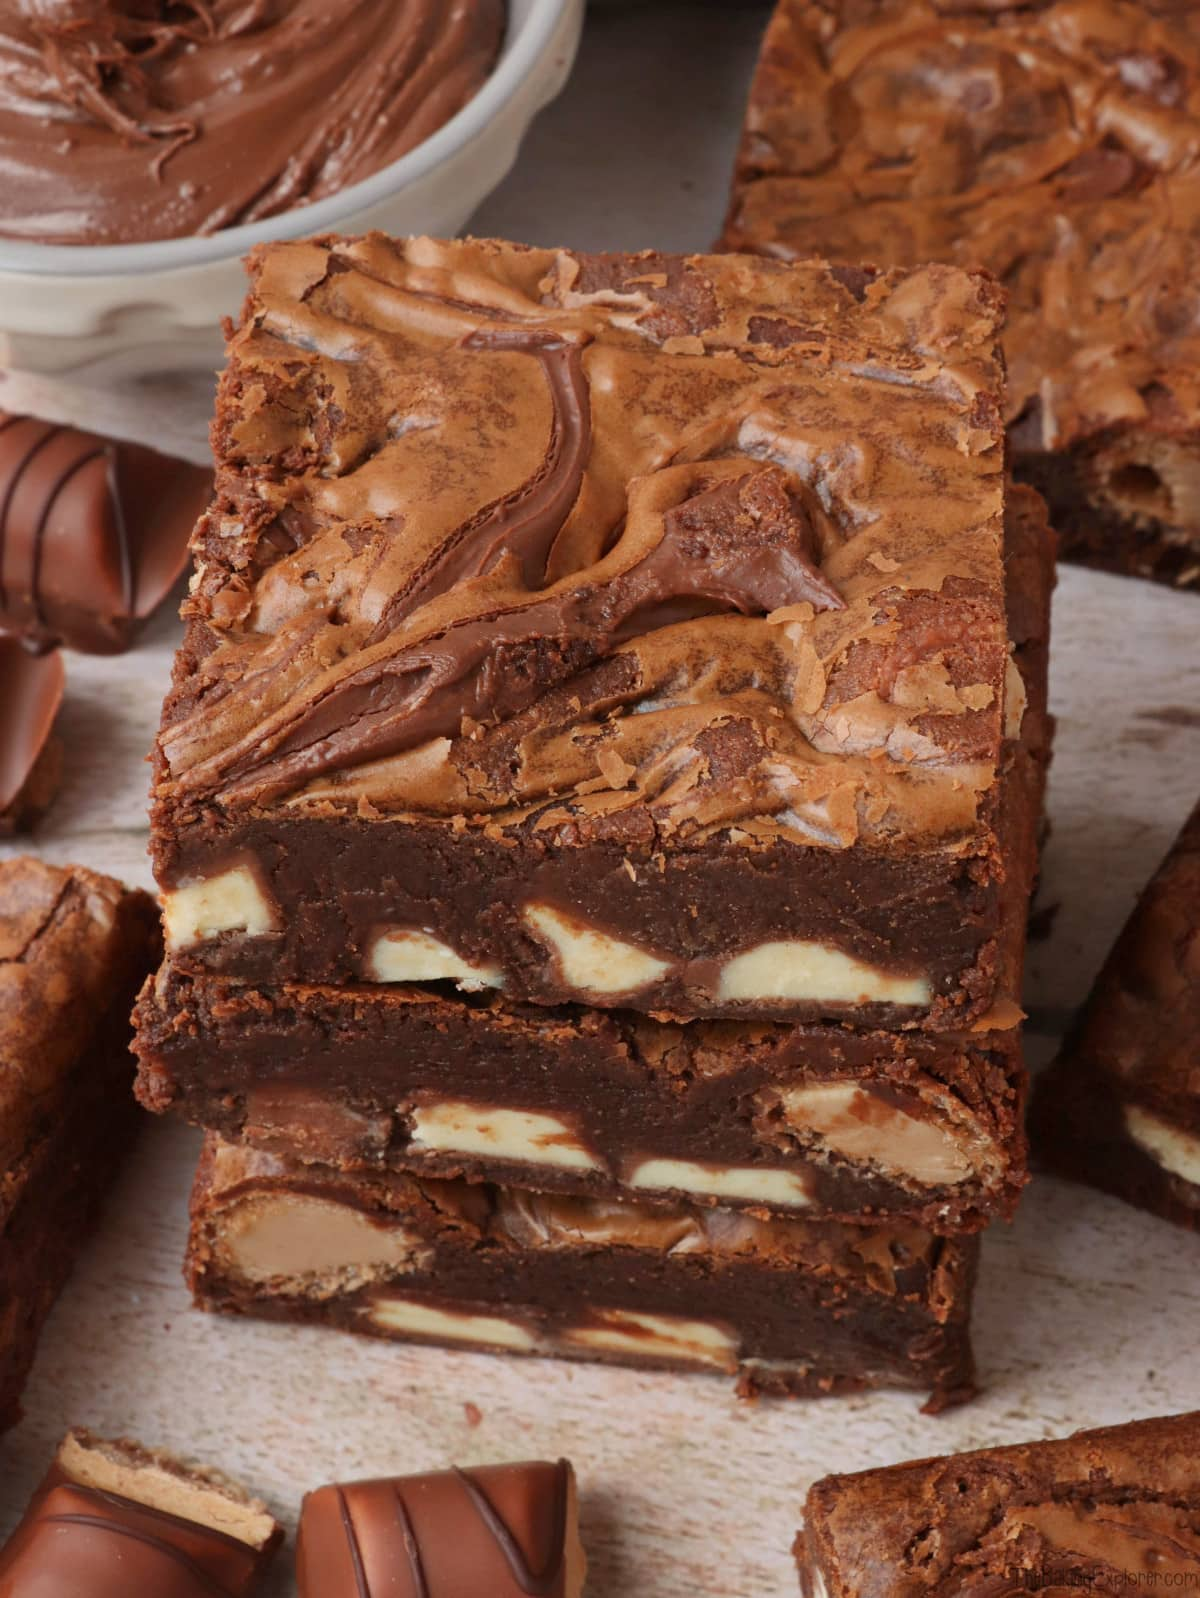 Nutella Kinder Bueno Brownies